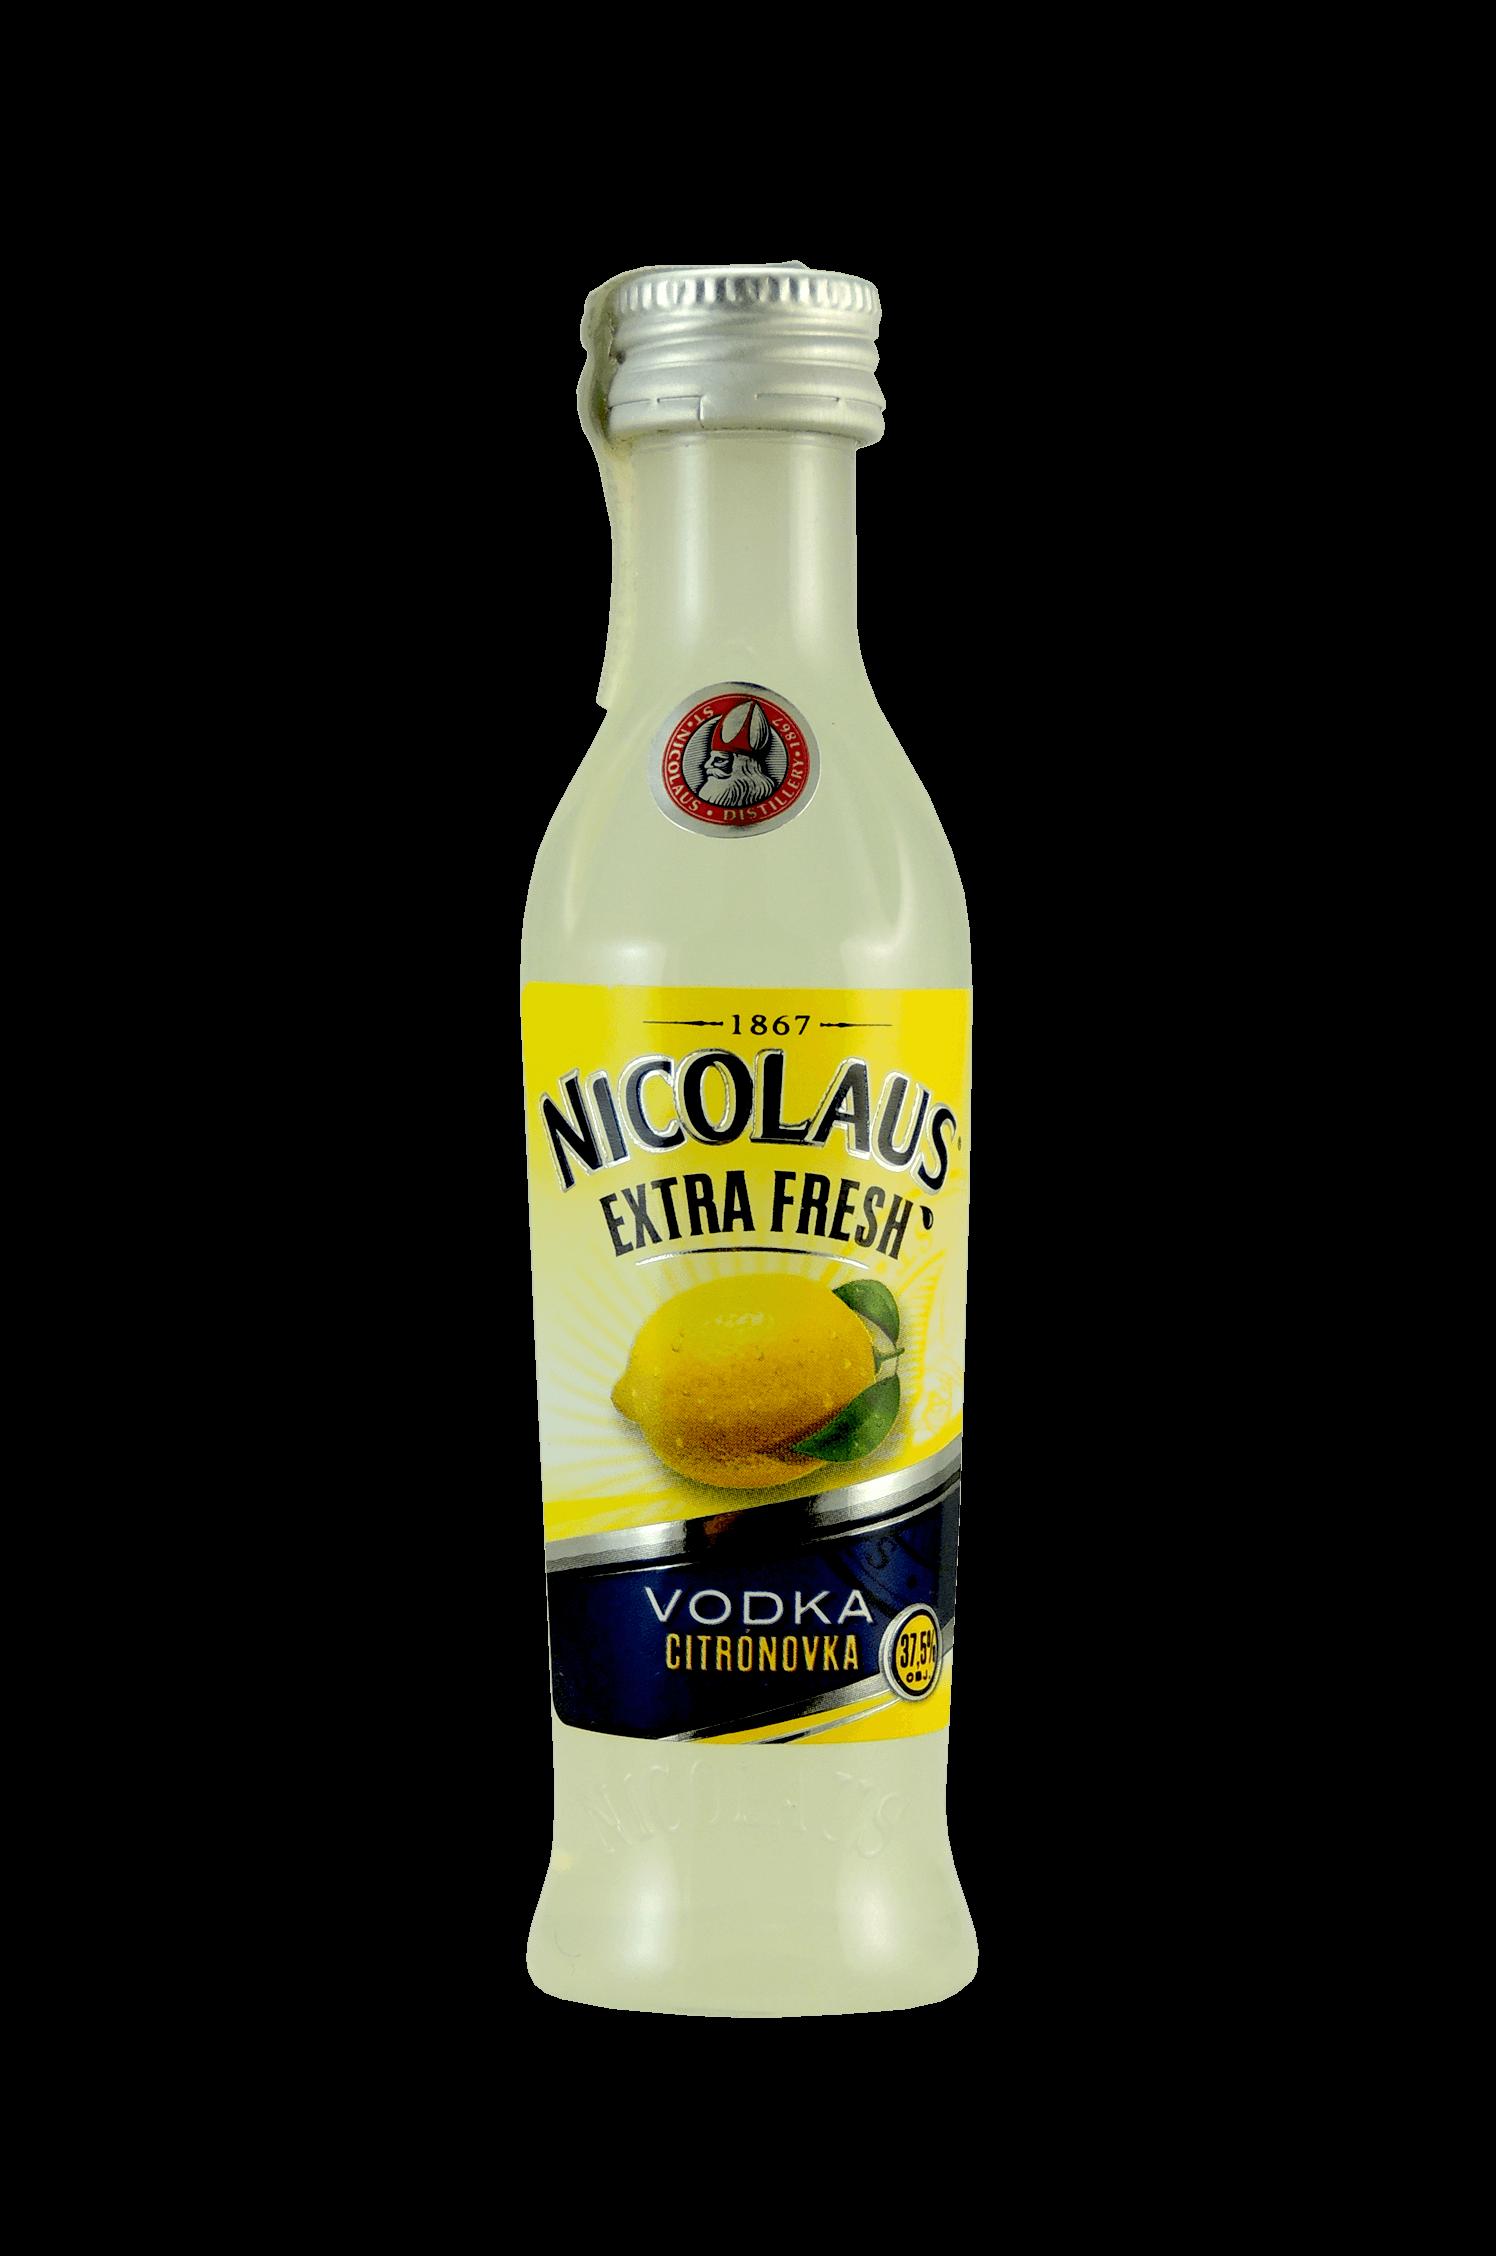 Nicolaus Extra Fresh